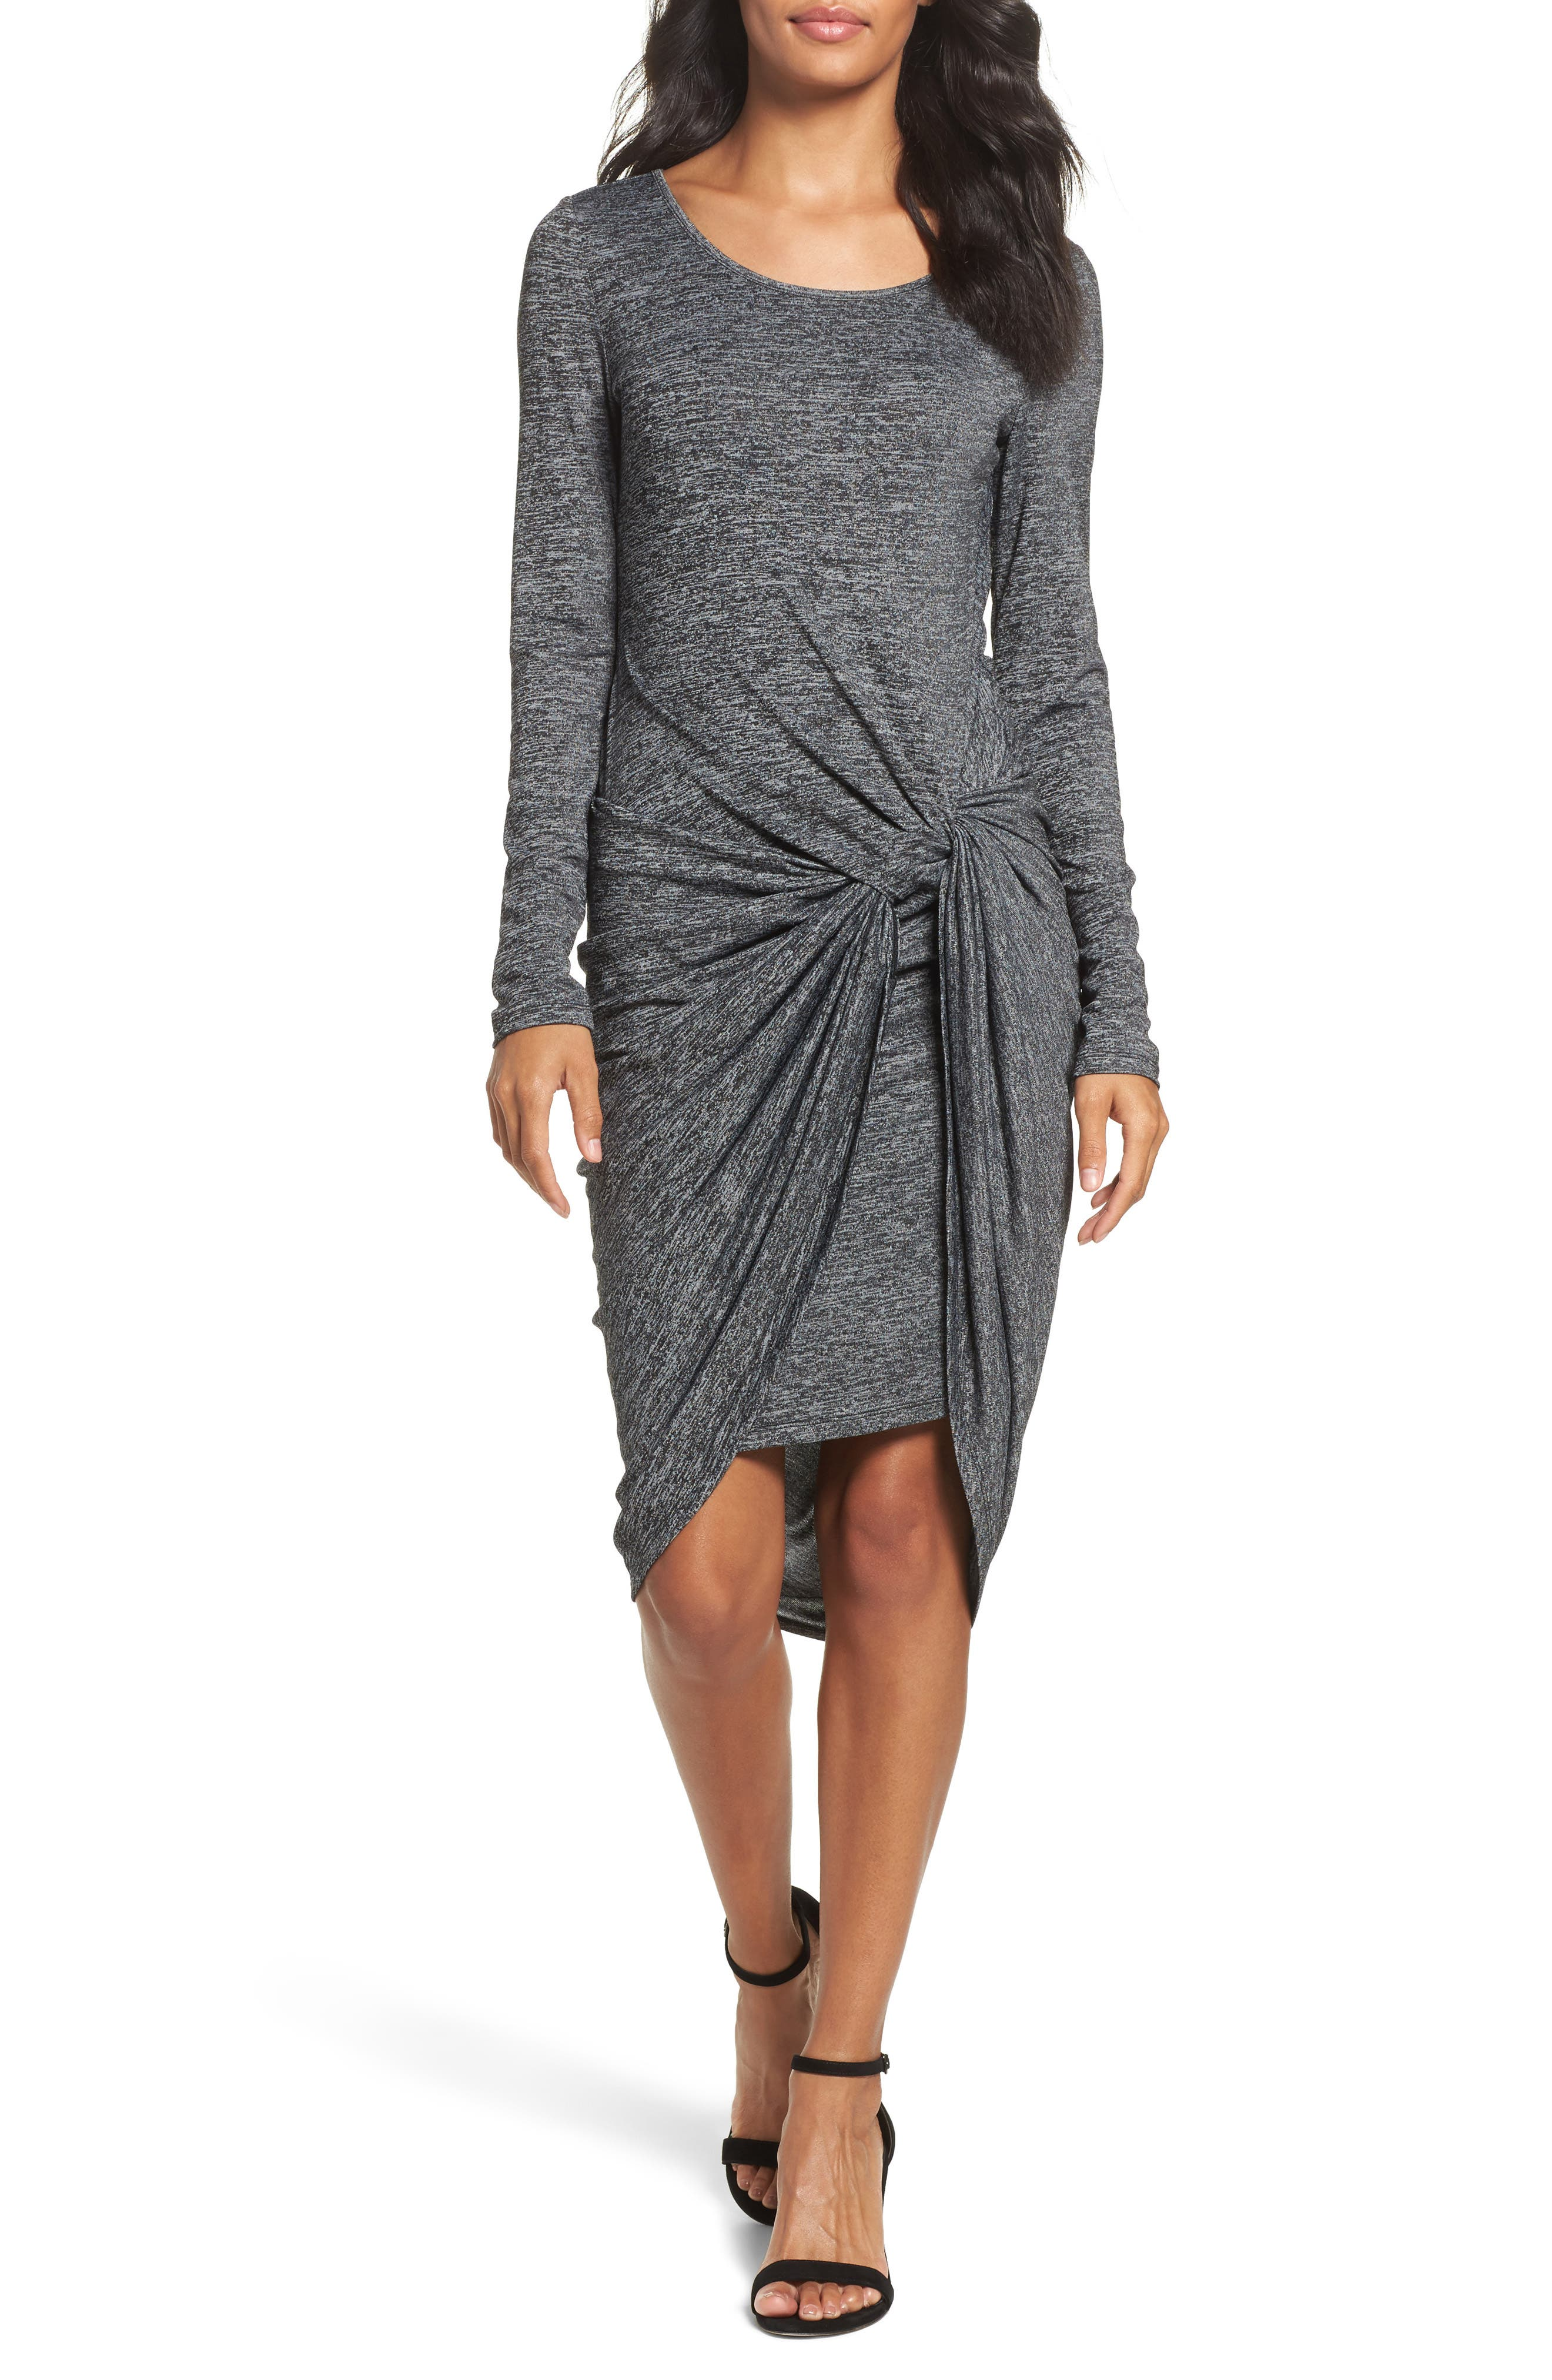 Adrianna Papell Jaspee Knot Midi Dress